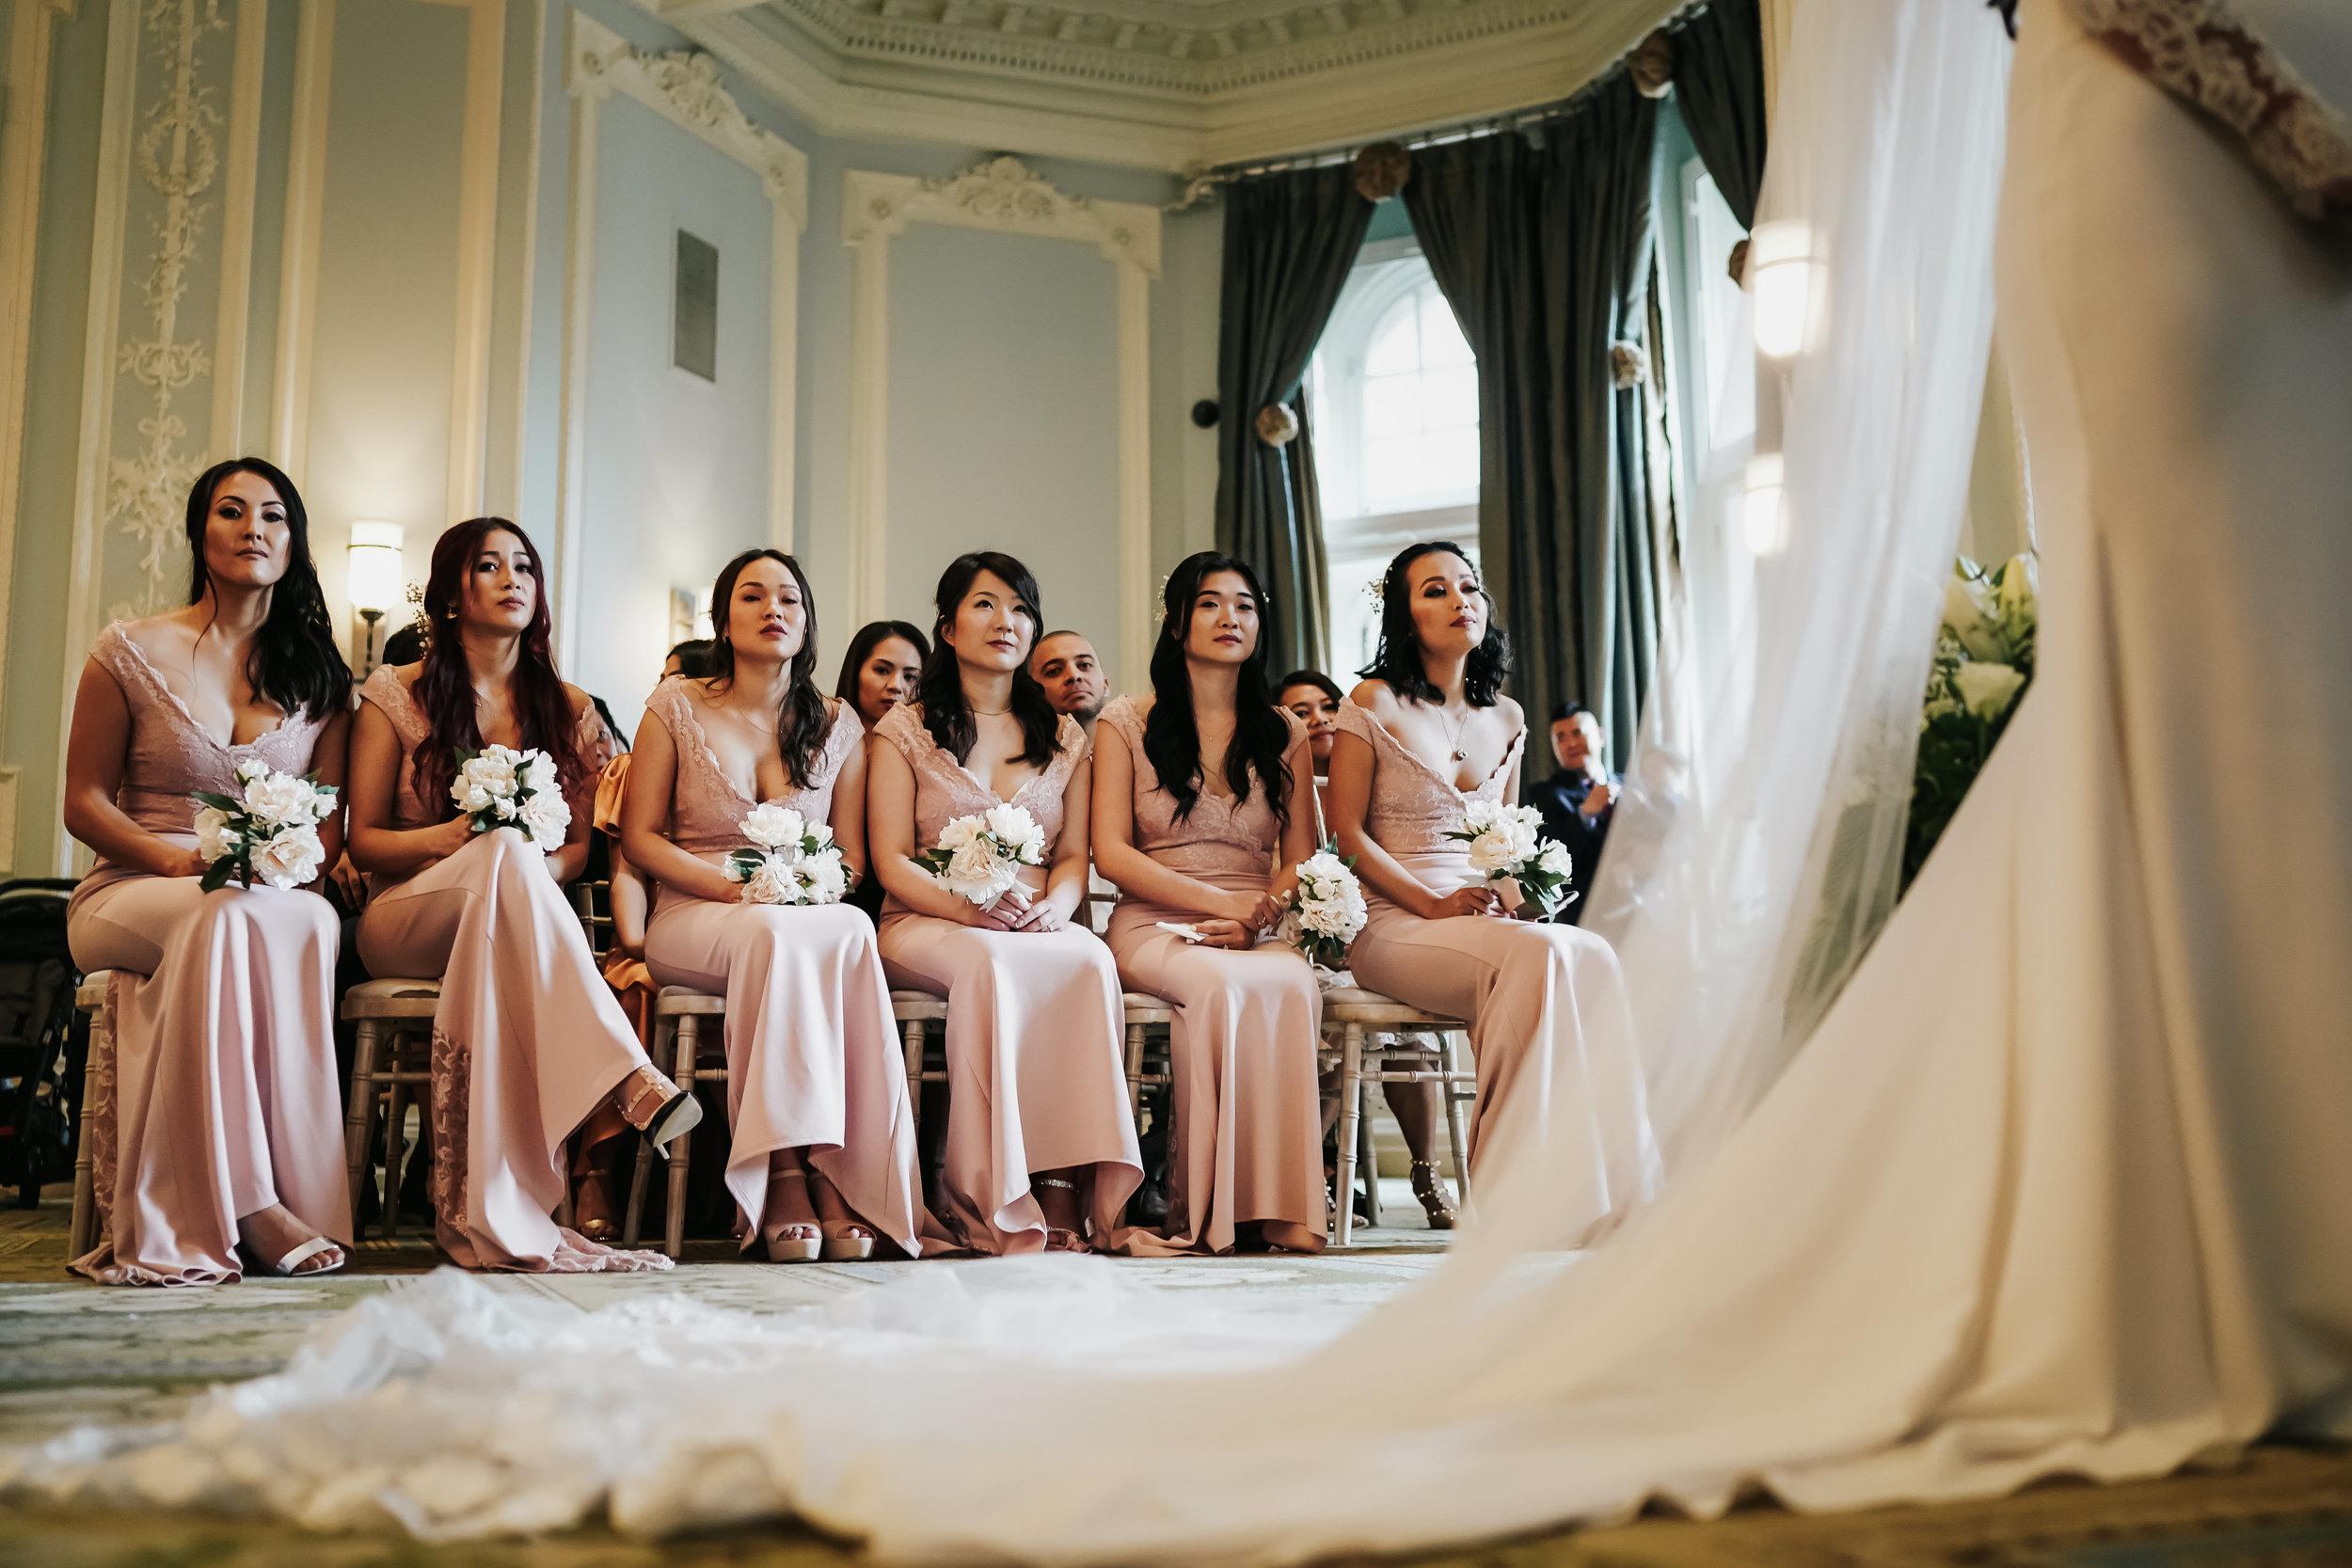 Chinese Wedding Photography Manchester wedding photographer Cheshire - 018.jpg